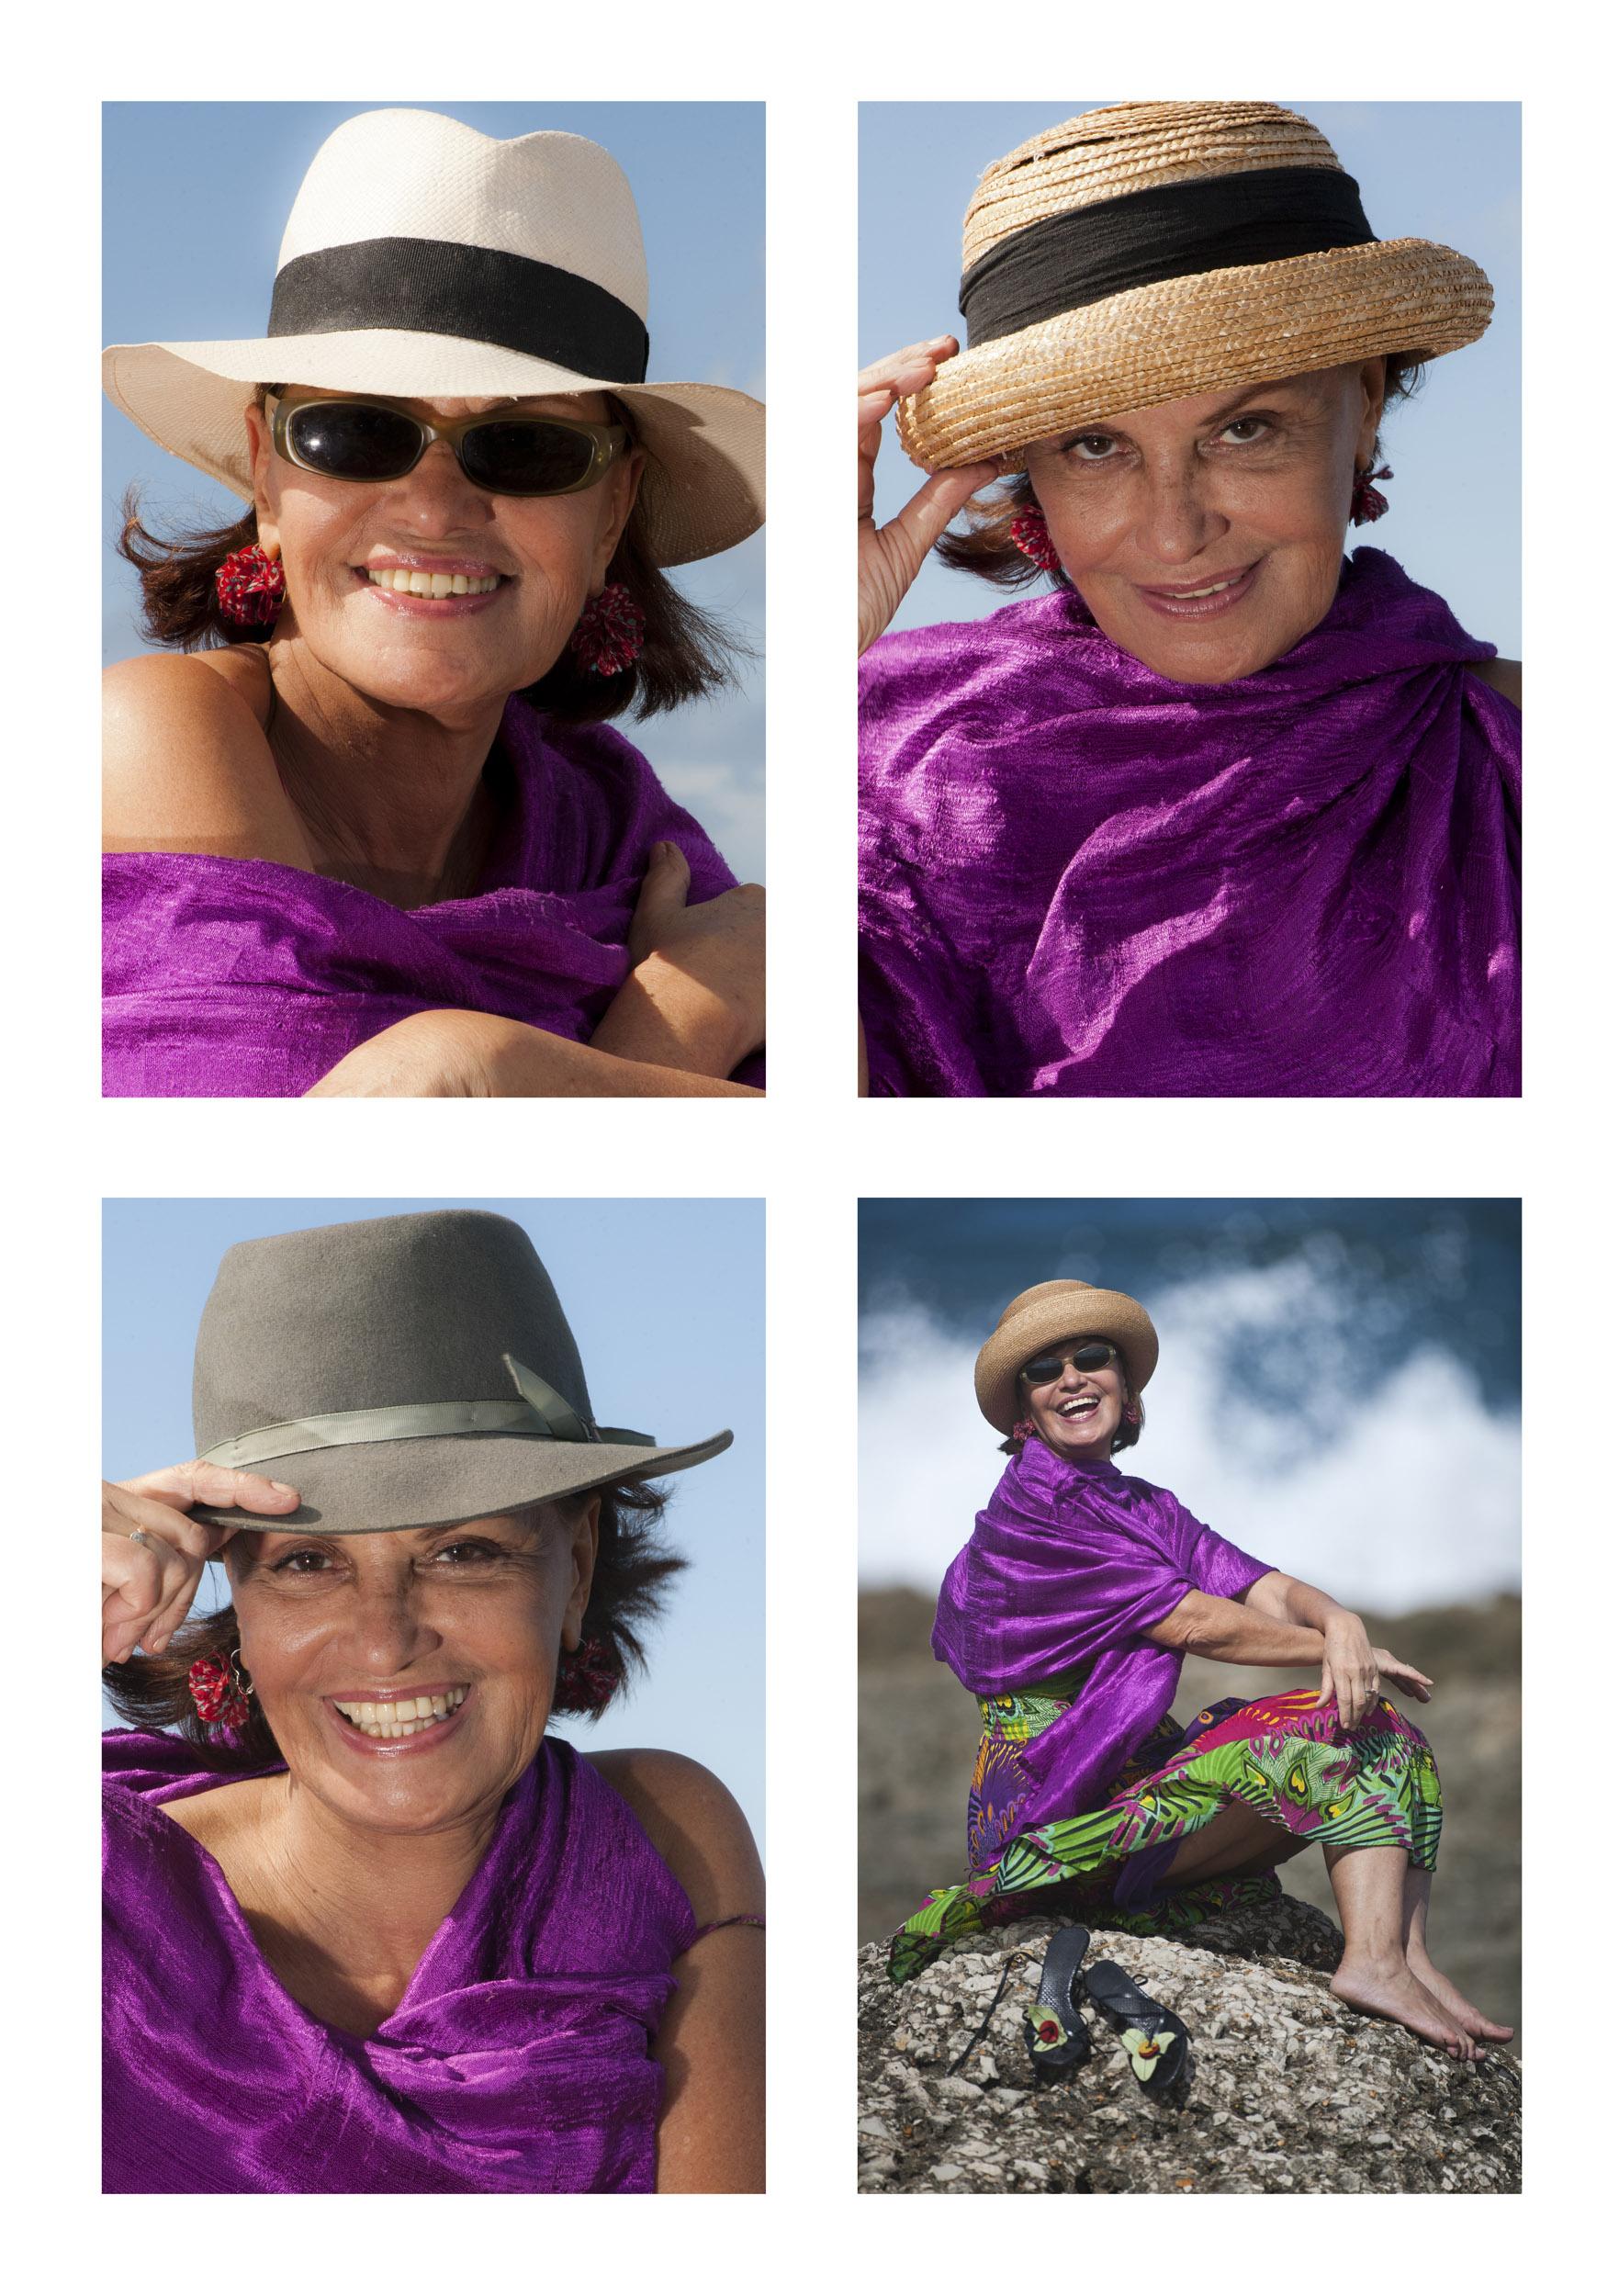 Myrtha Ibarra, actress - Illuminated Cuba - Hector Garrido, Aerial and human photography